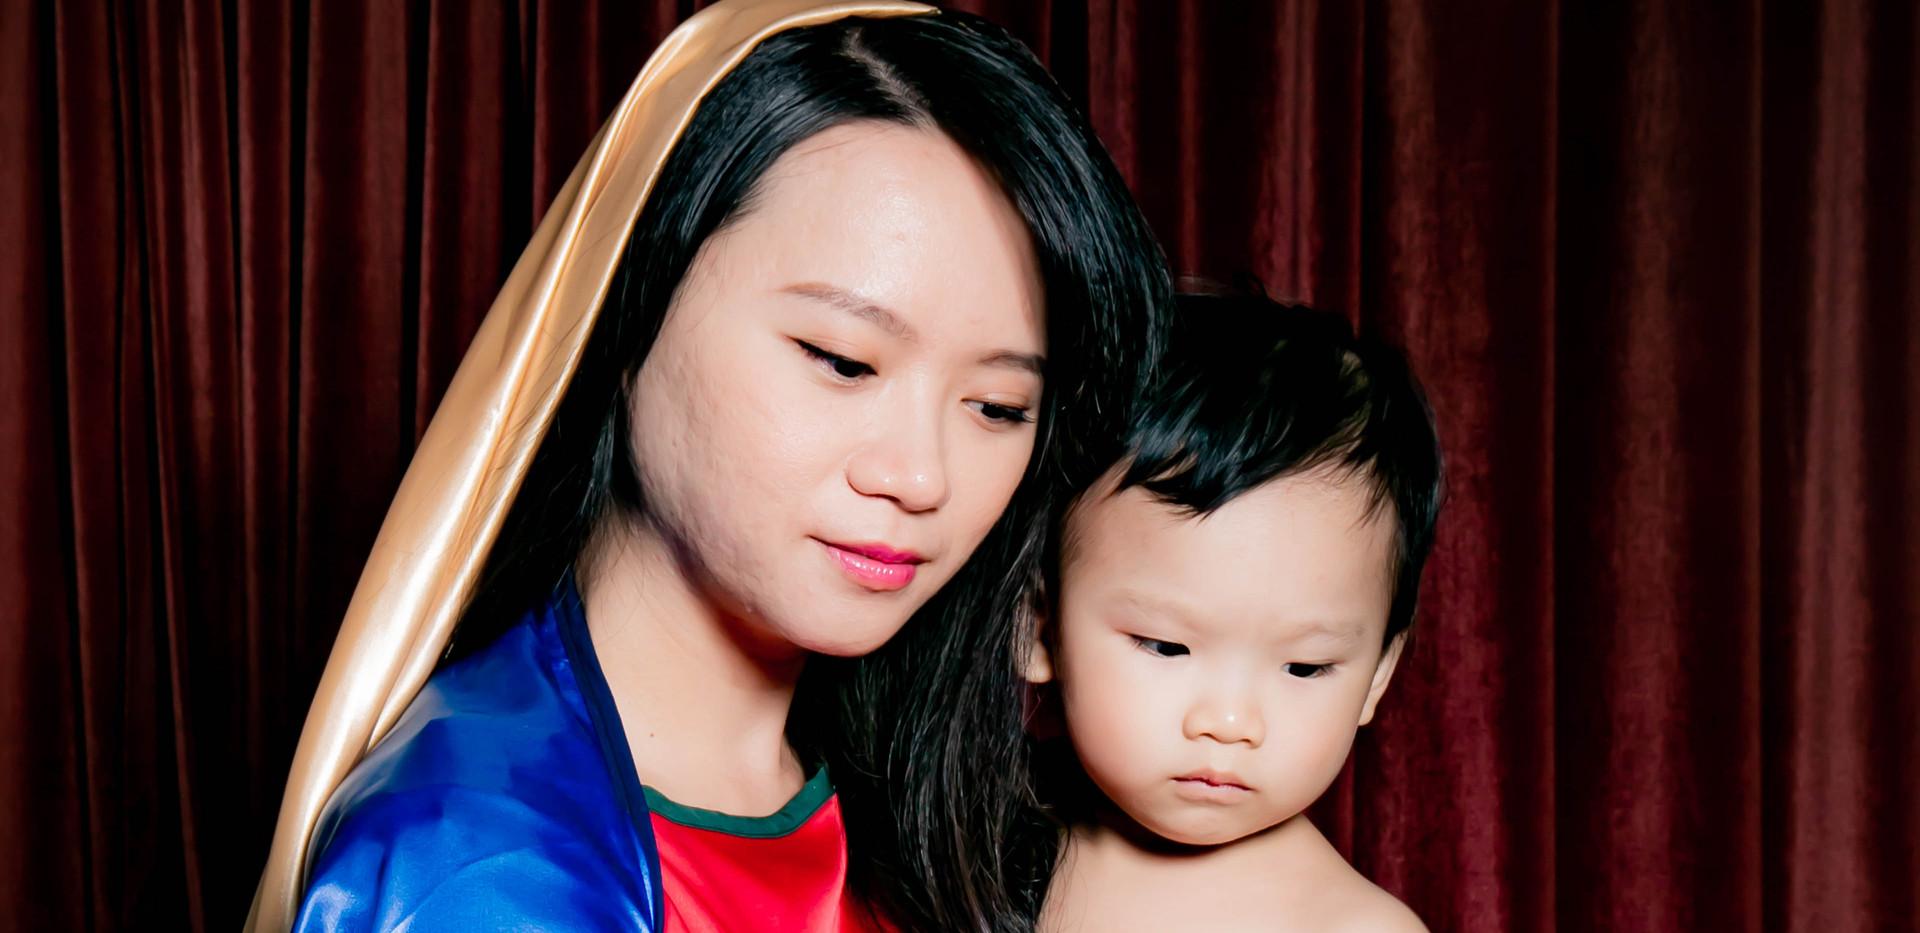 yichiao  21 century madonna and child 2.